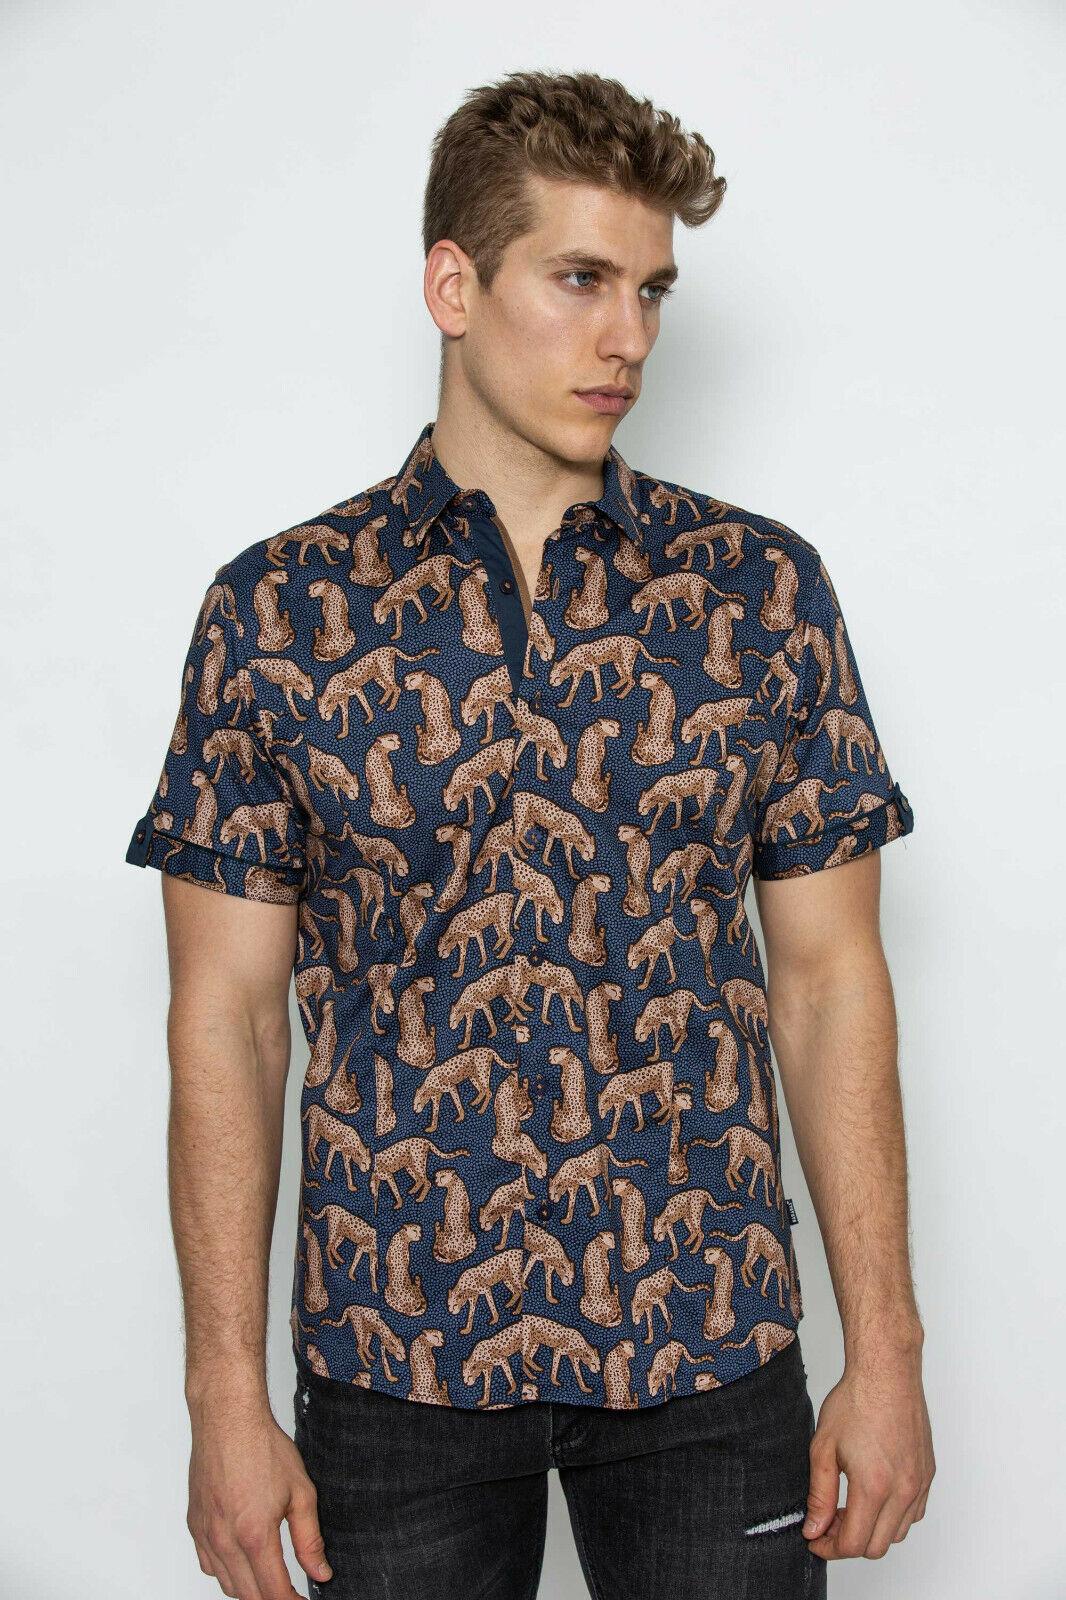 Barabas Short Sleeve Dress hemd Leopard herren